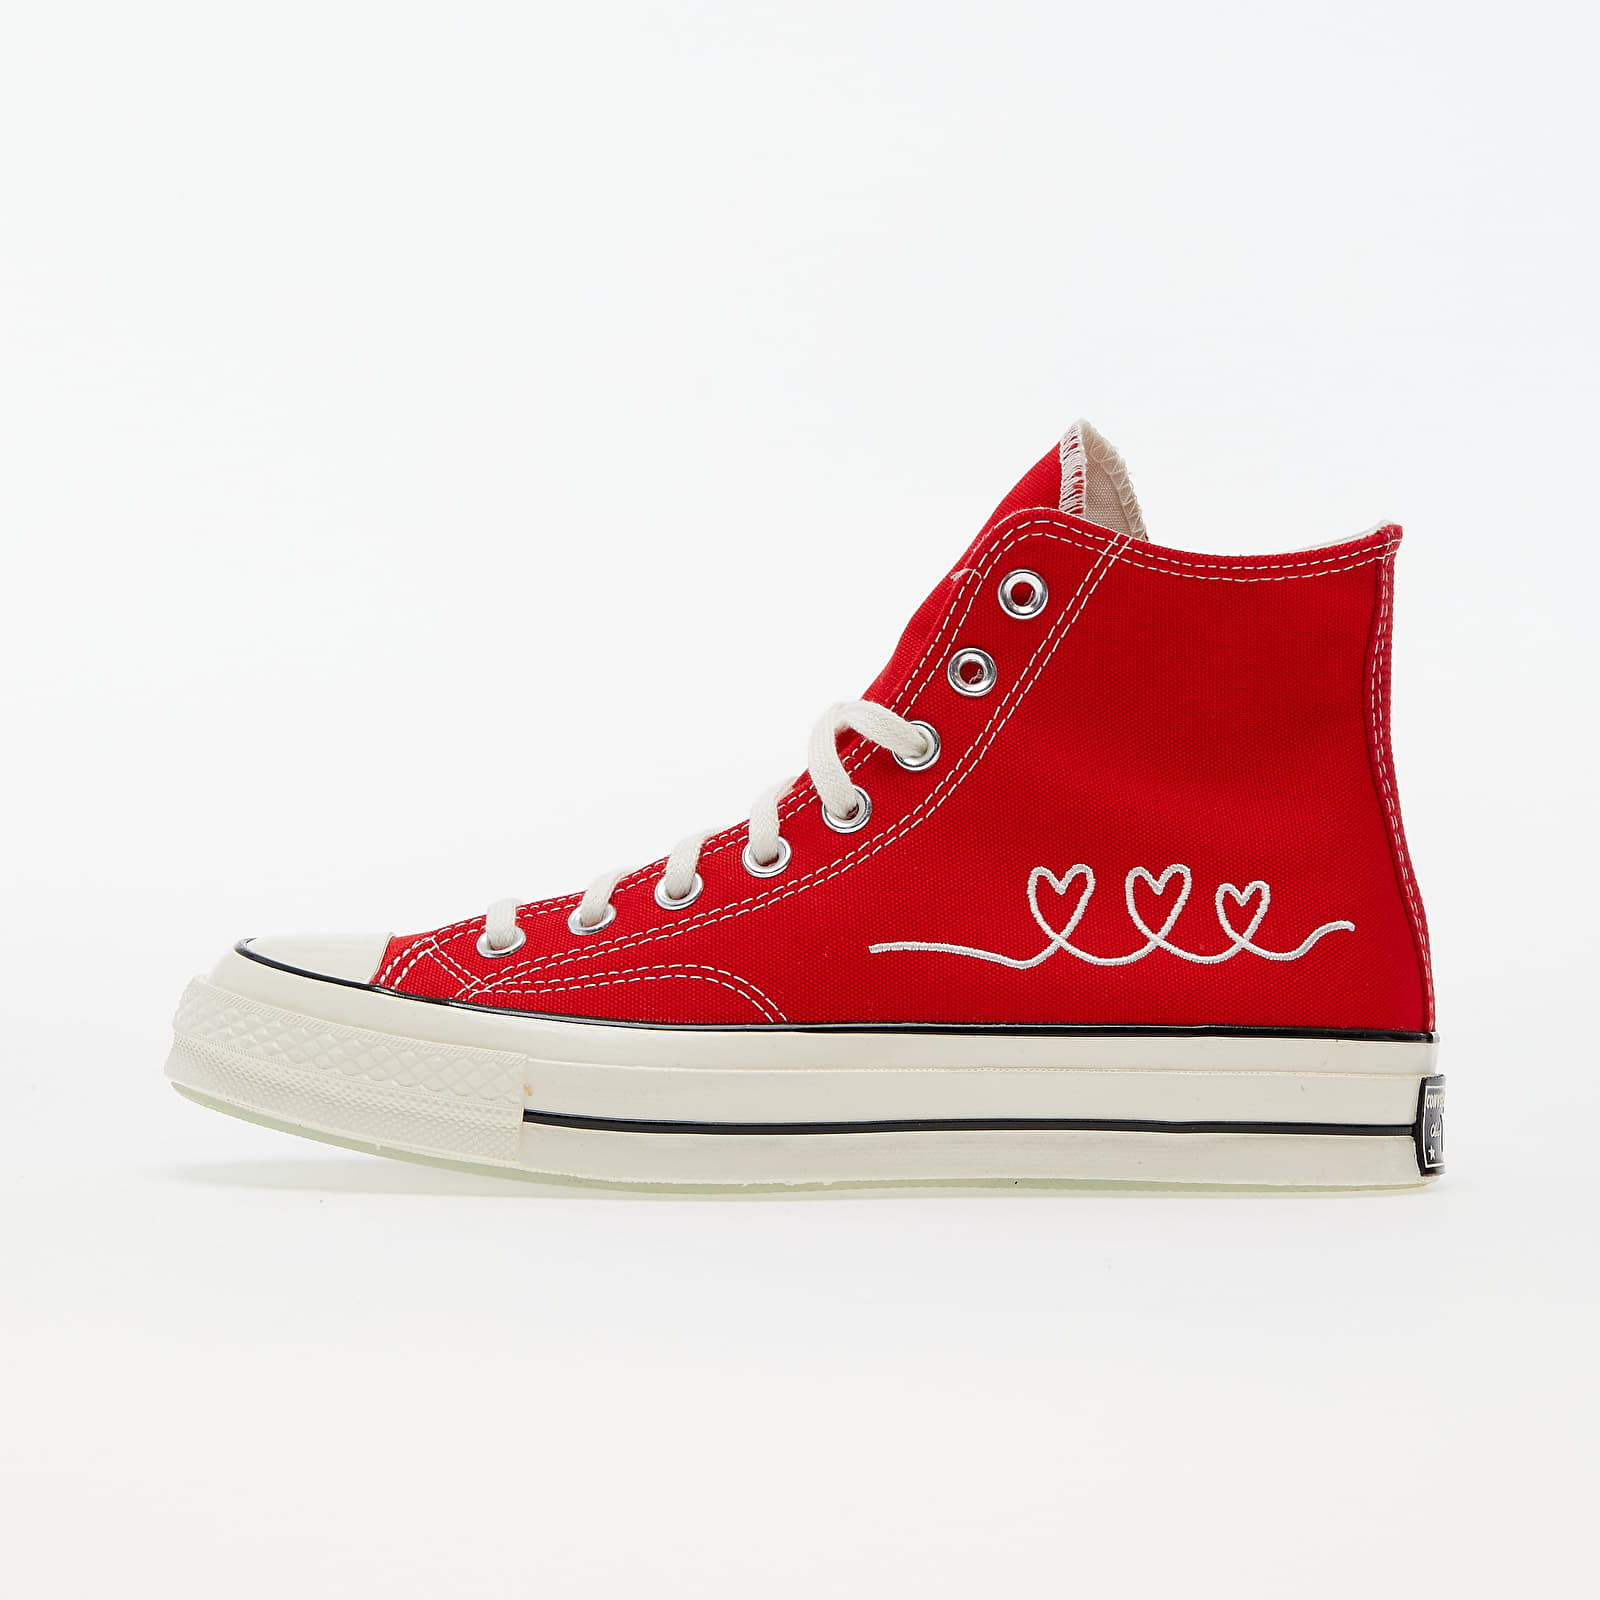 Converse Chuck 70 University Red/ Egret/ Black 171117C